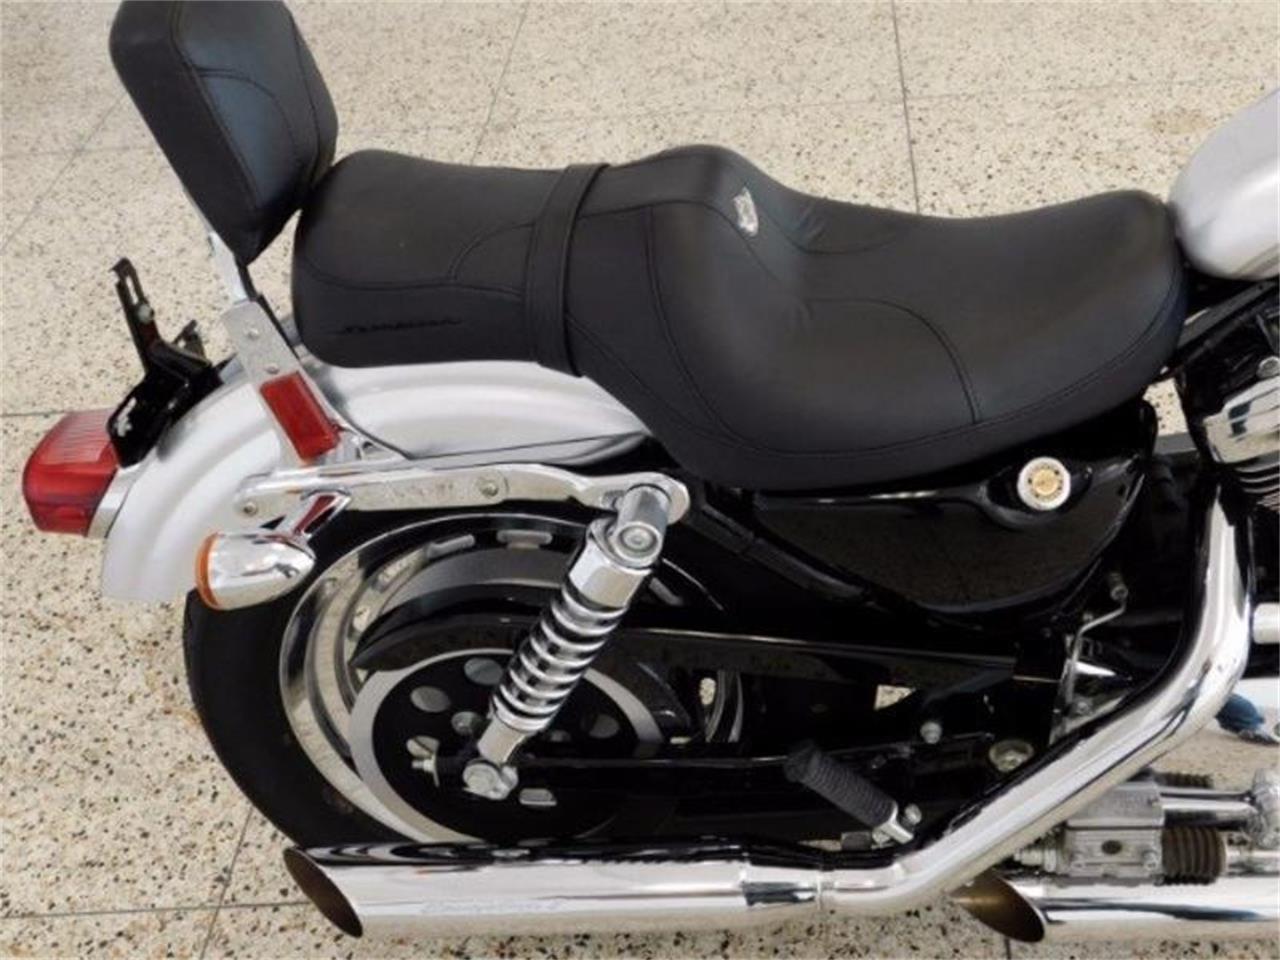 2003 Harley-Davidson Sportster (CC-1109155) for sale in Hamburg, New York